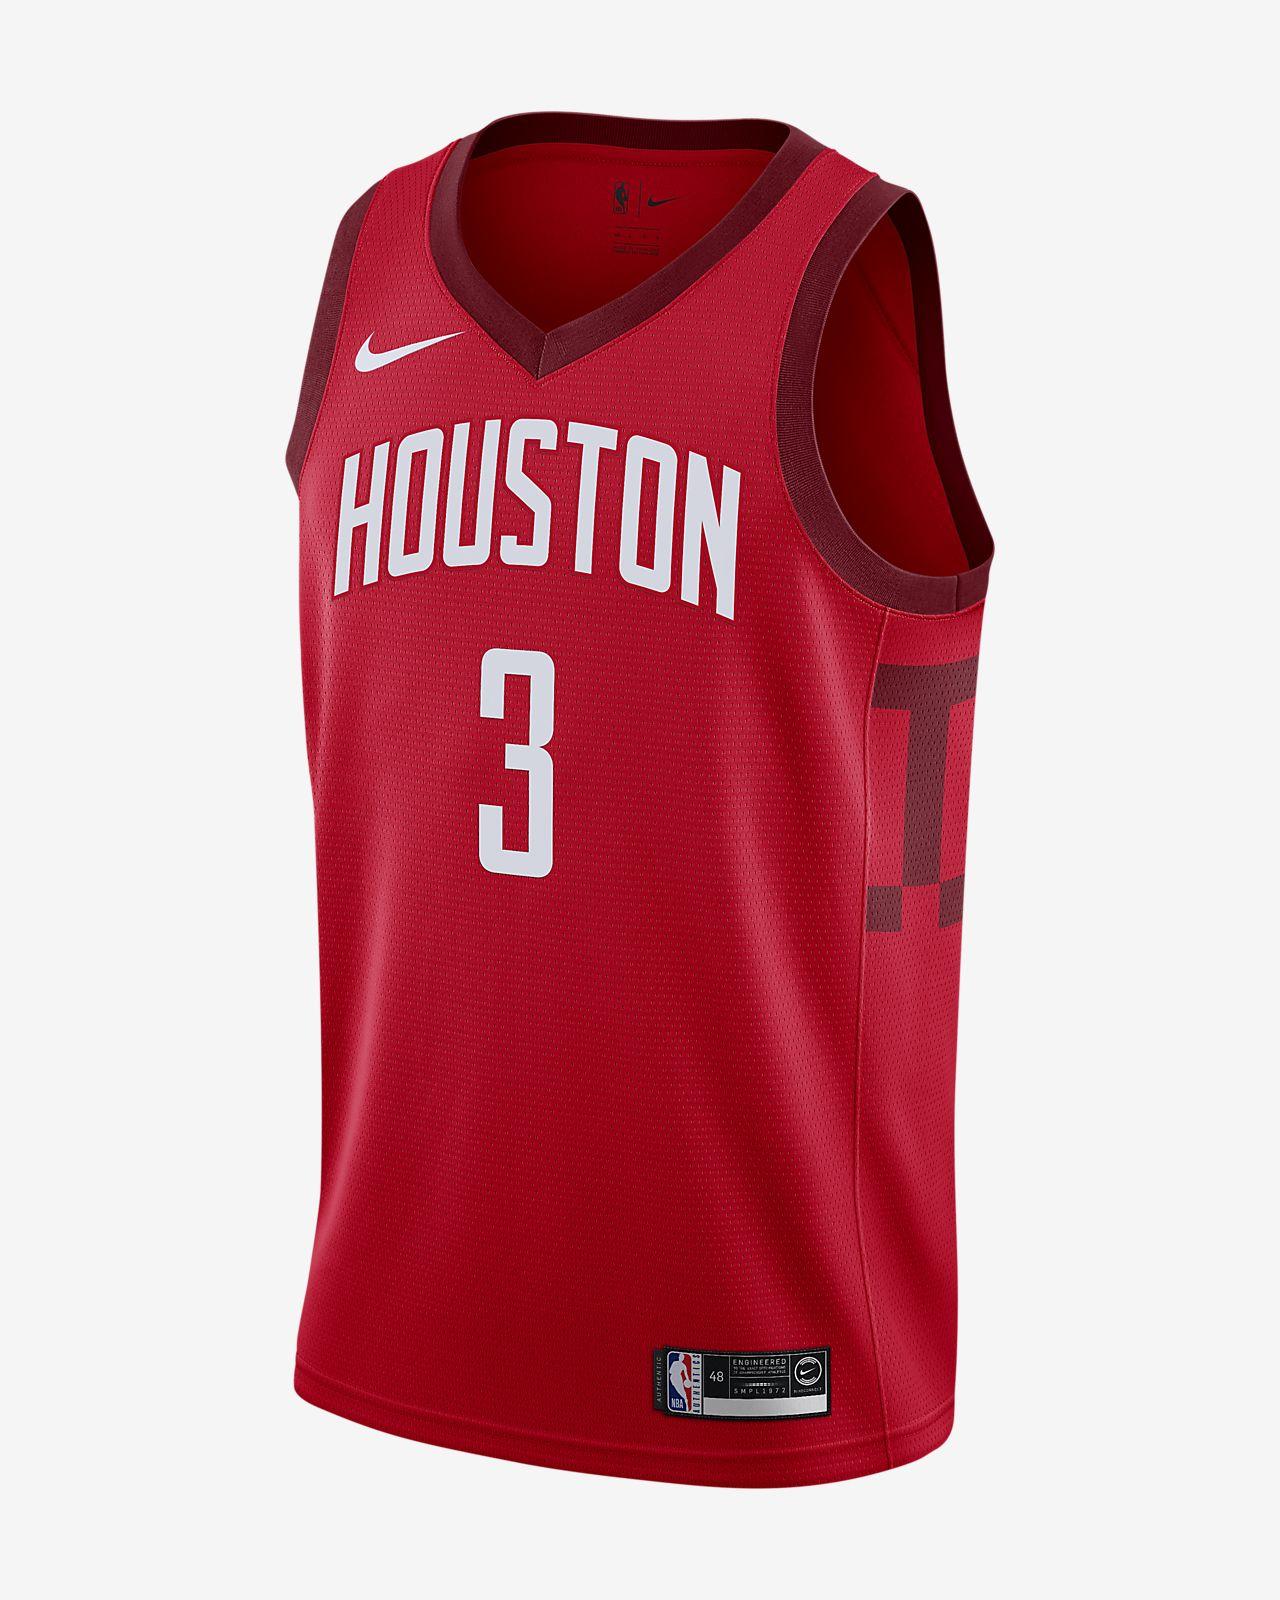 0c9c014b4 ... Chris Paul Earned Statement Edition Swingman (Houston Rockets) Nike NBA  Connected Trikot für Herren